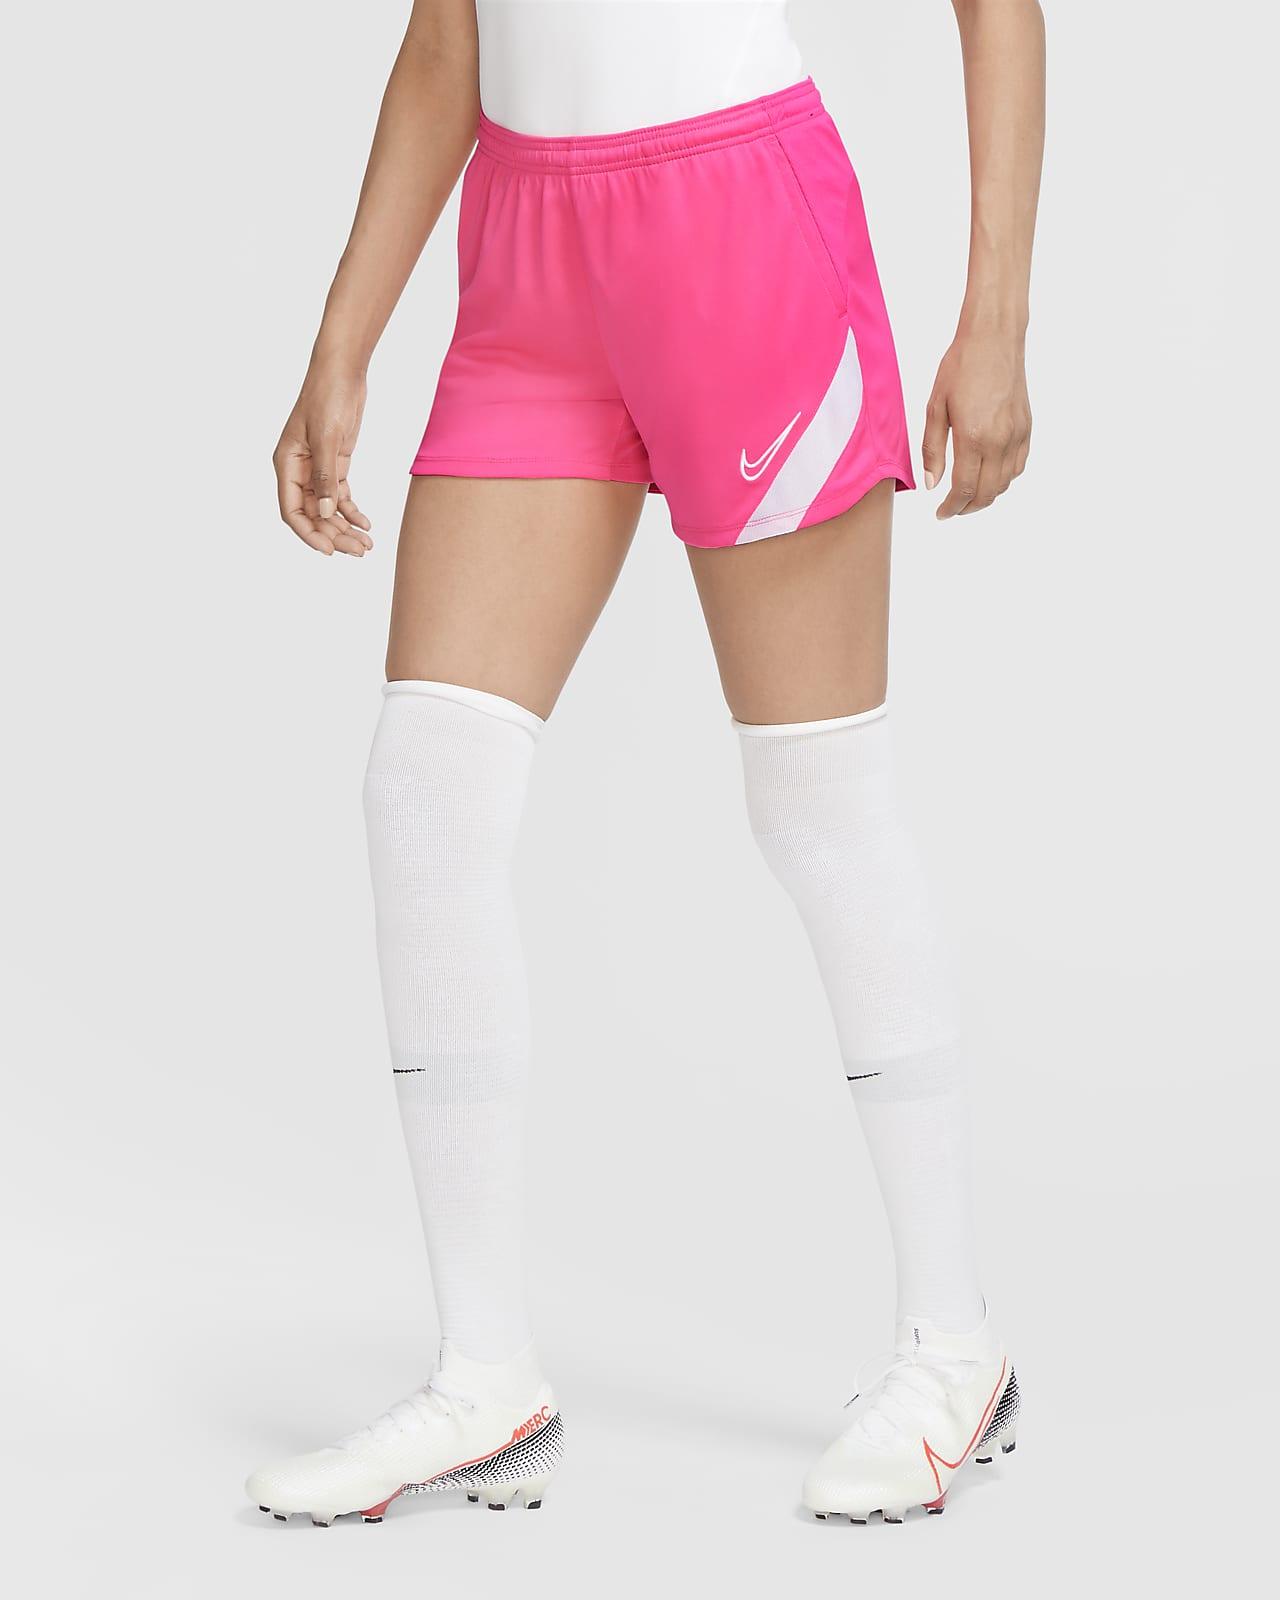 Nike Dri-FIT Academy Pro Women's Soccer Shorts